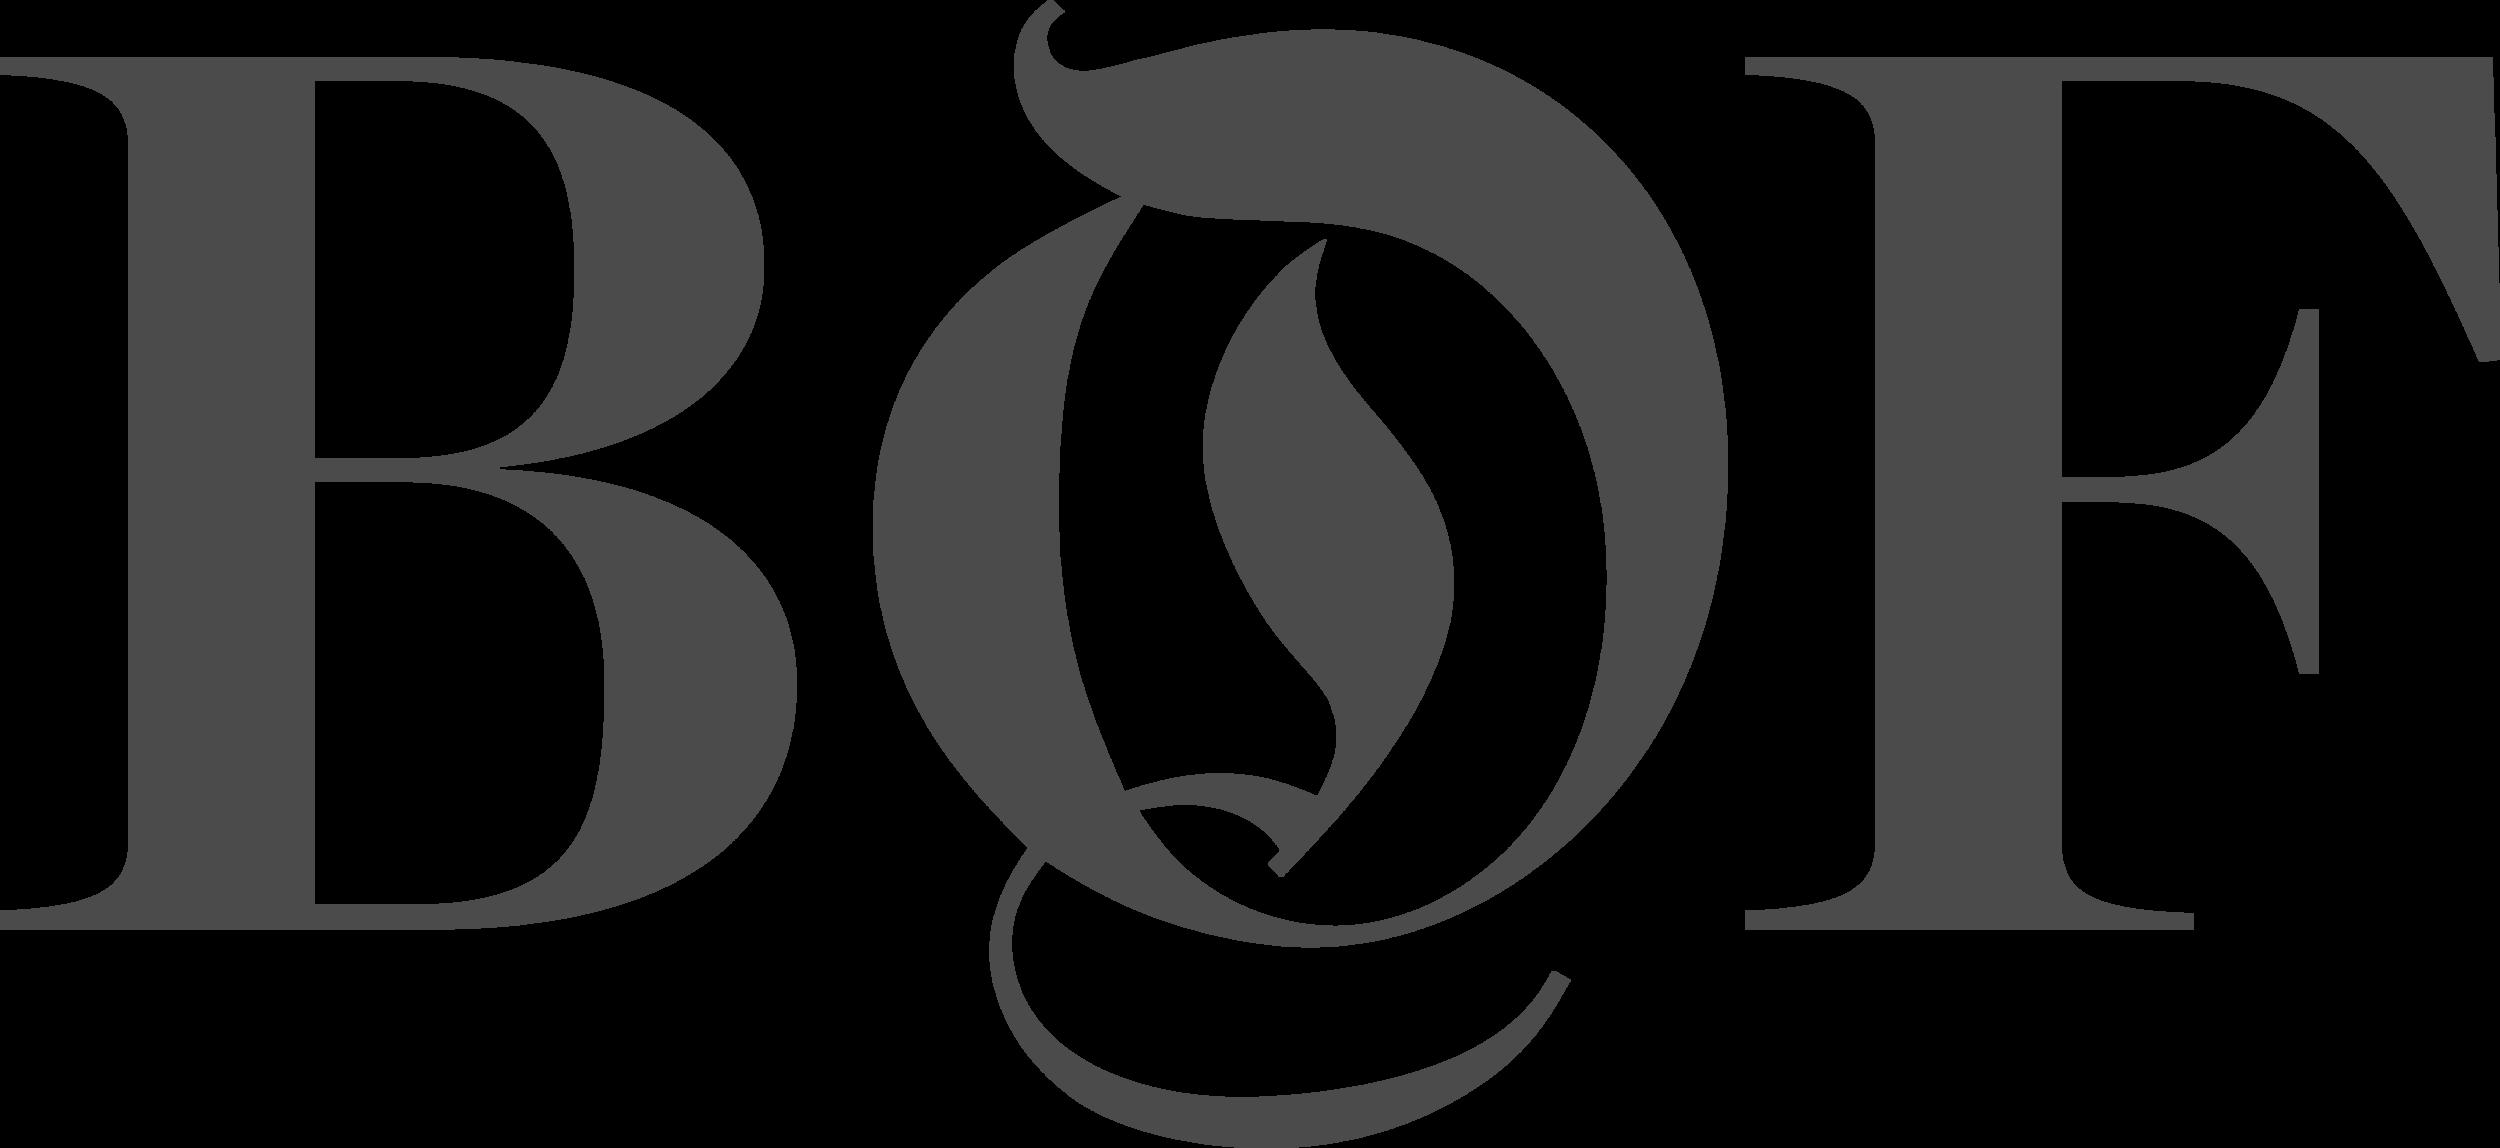 bof-logo Grey.png